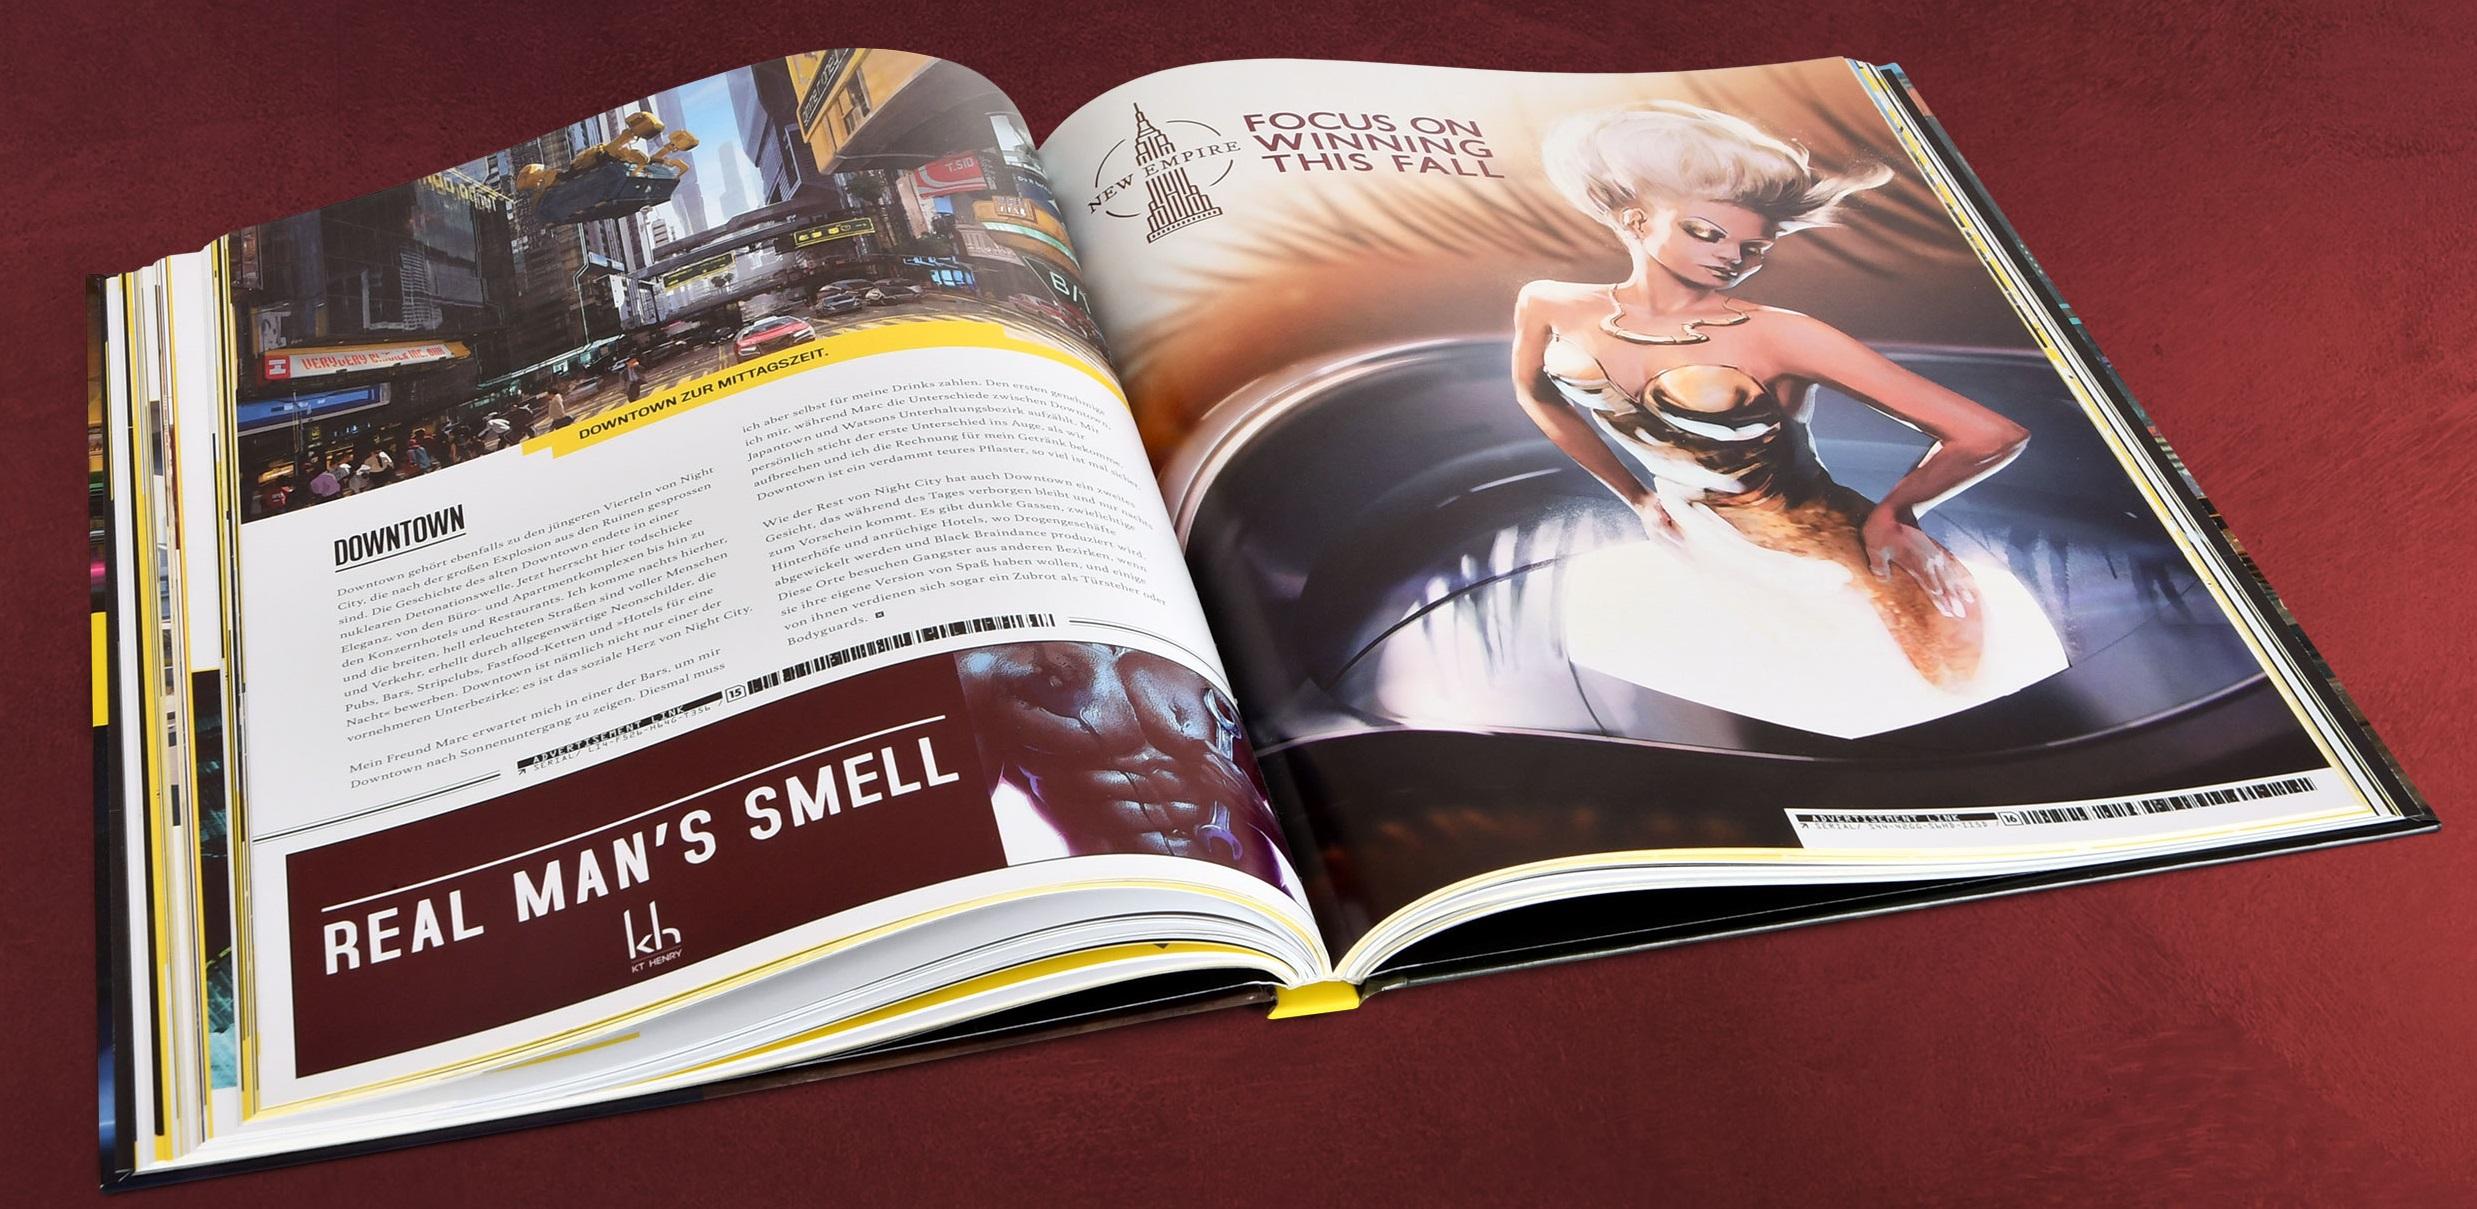 Cyberpunk 2077 Book Image 2